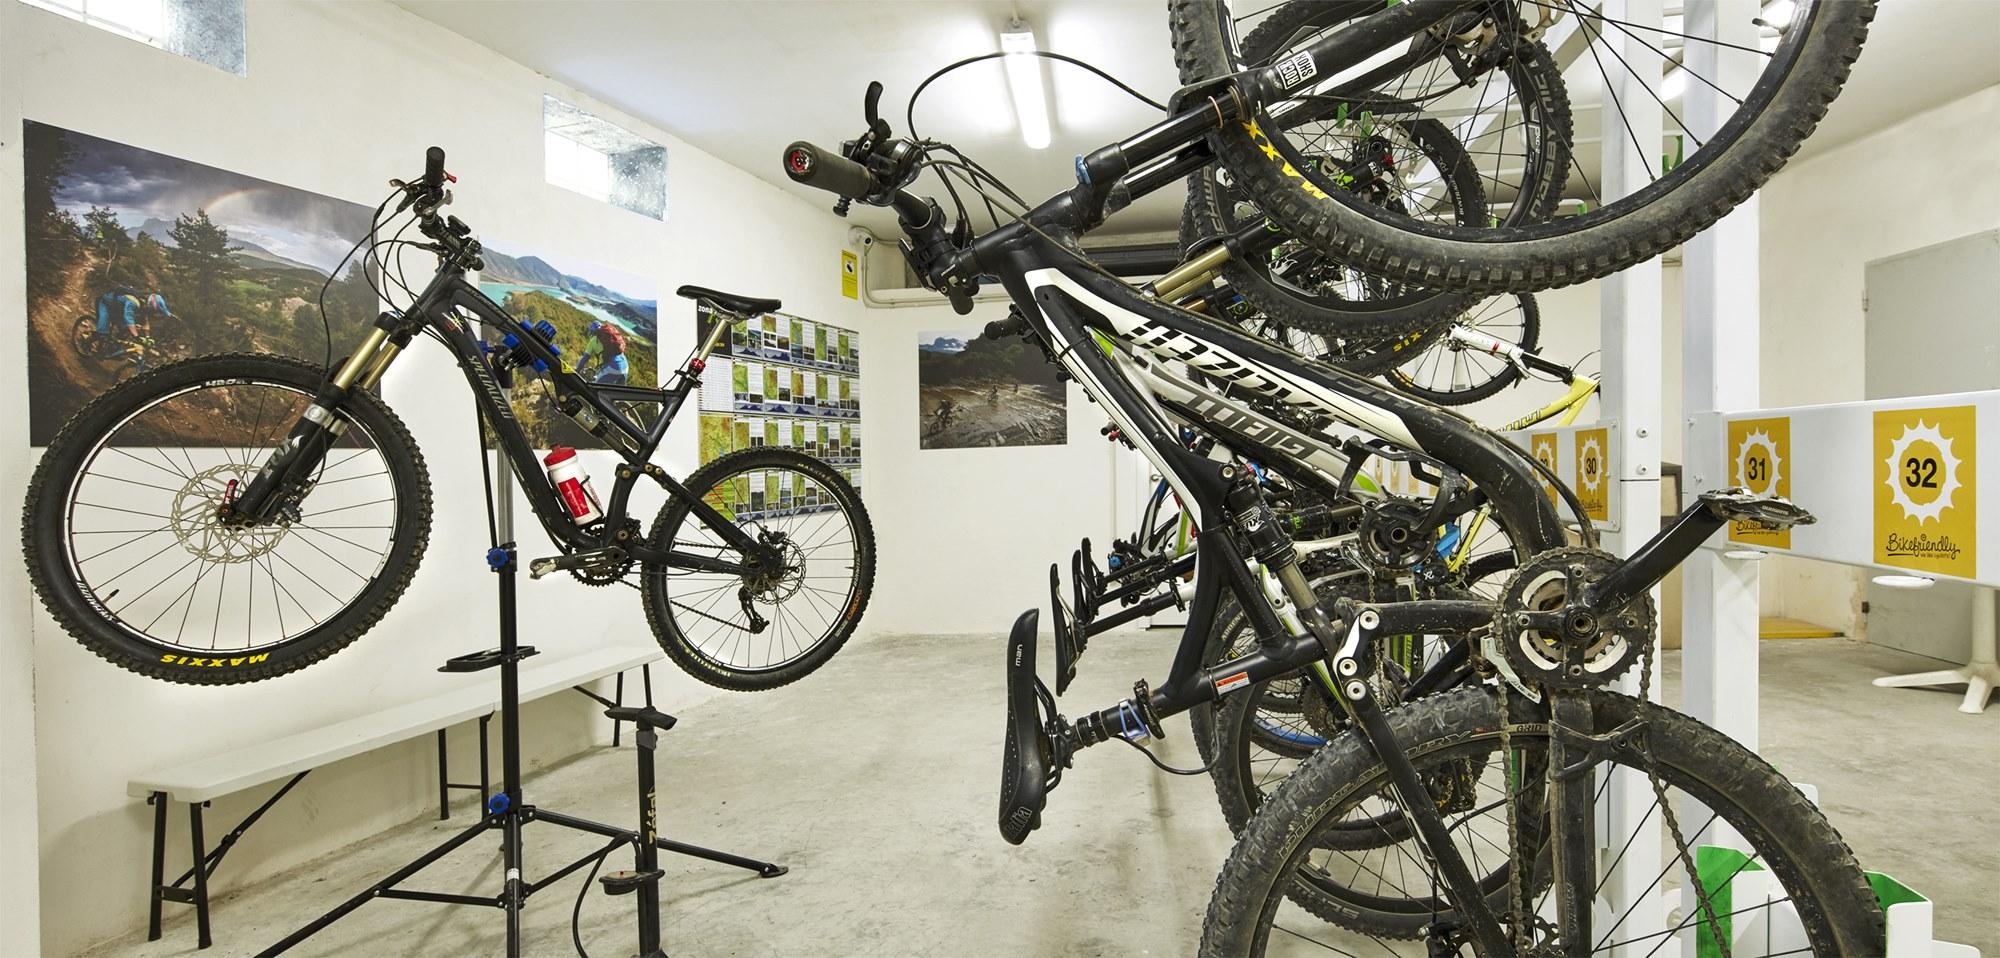 Bicicletero en Apartamentos 'Dos Ríos'.